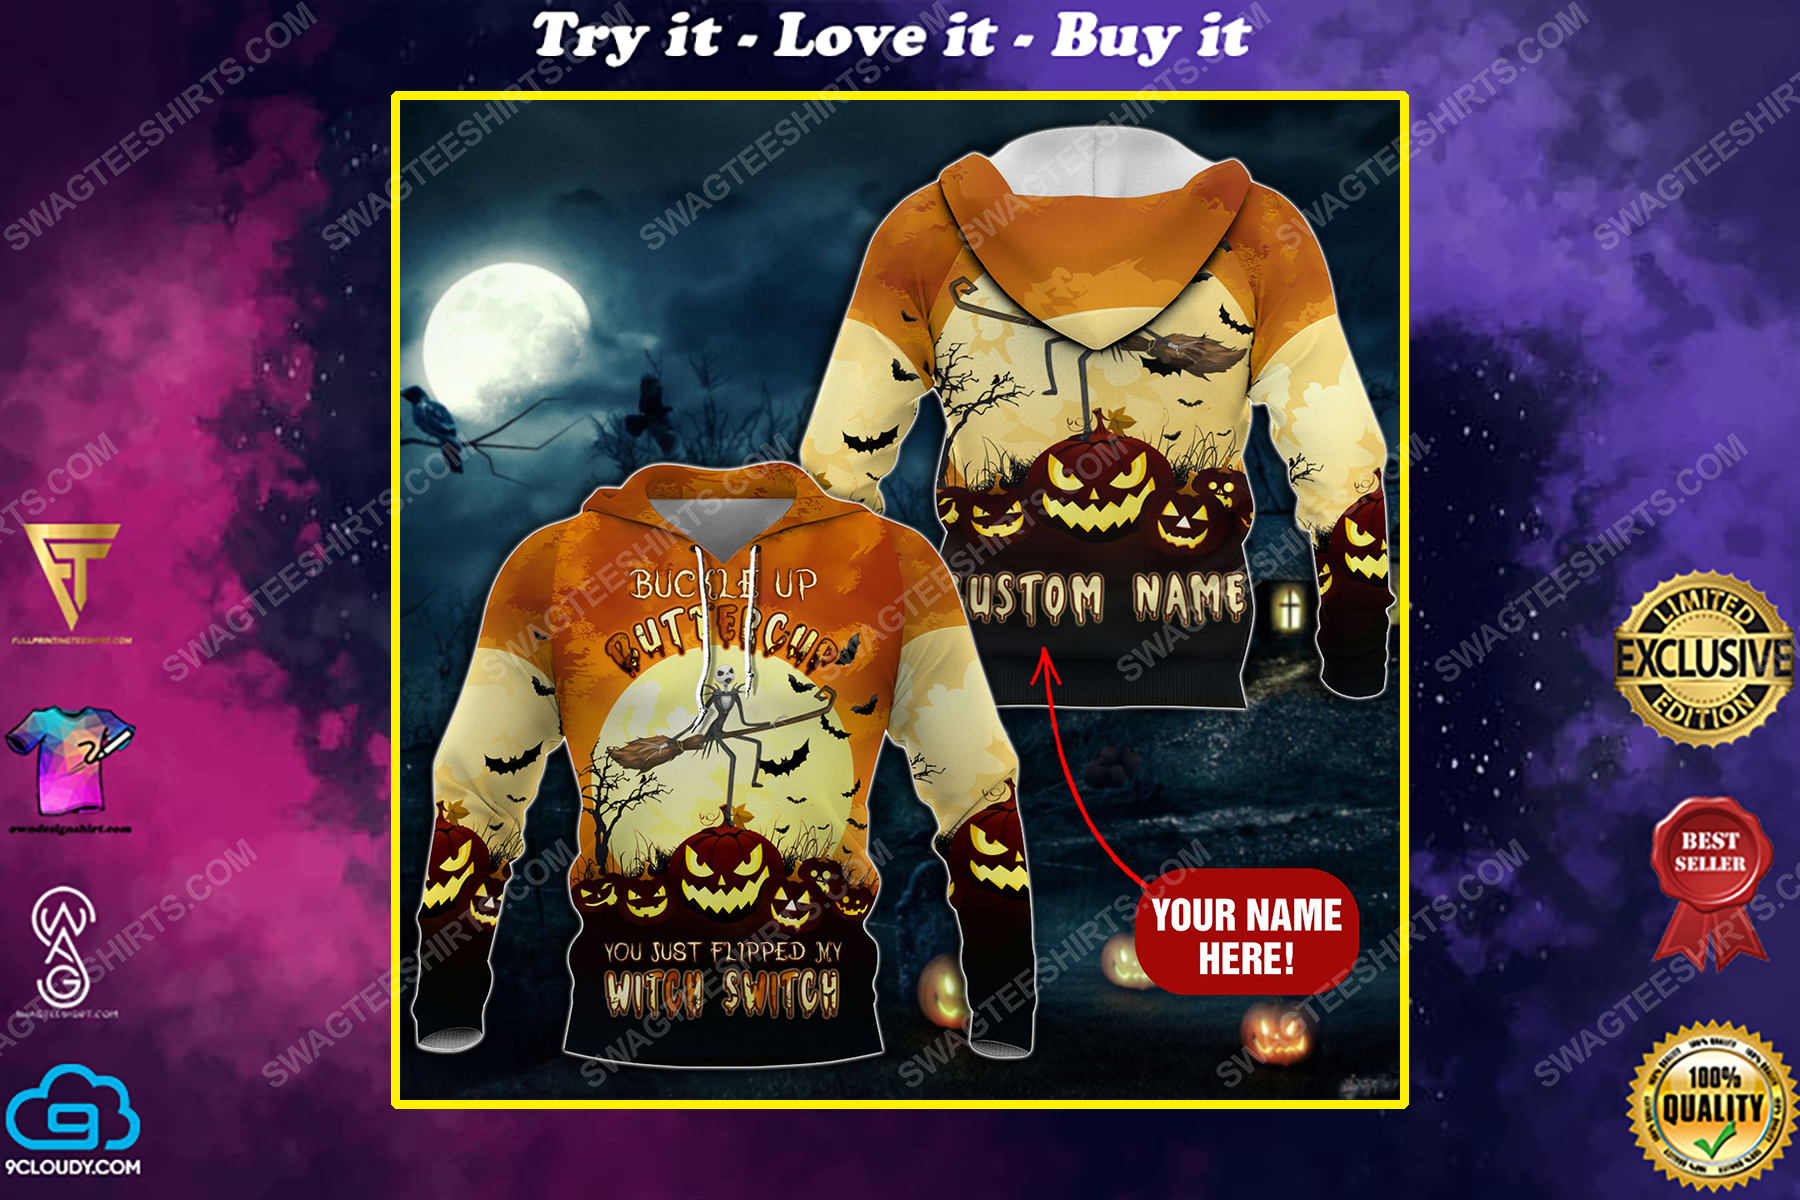 Custom buckle up buttercup you just flipped my witch switch pumpkin halloween shirt